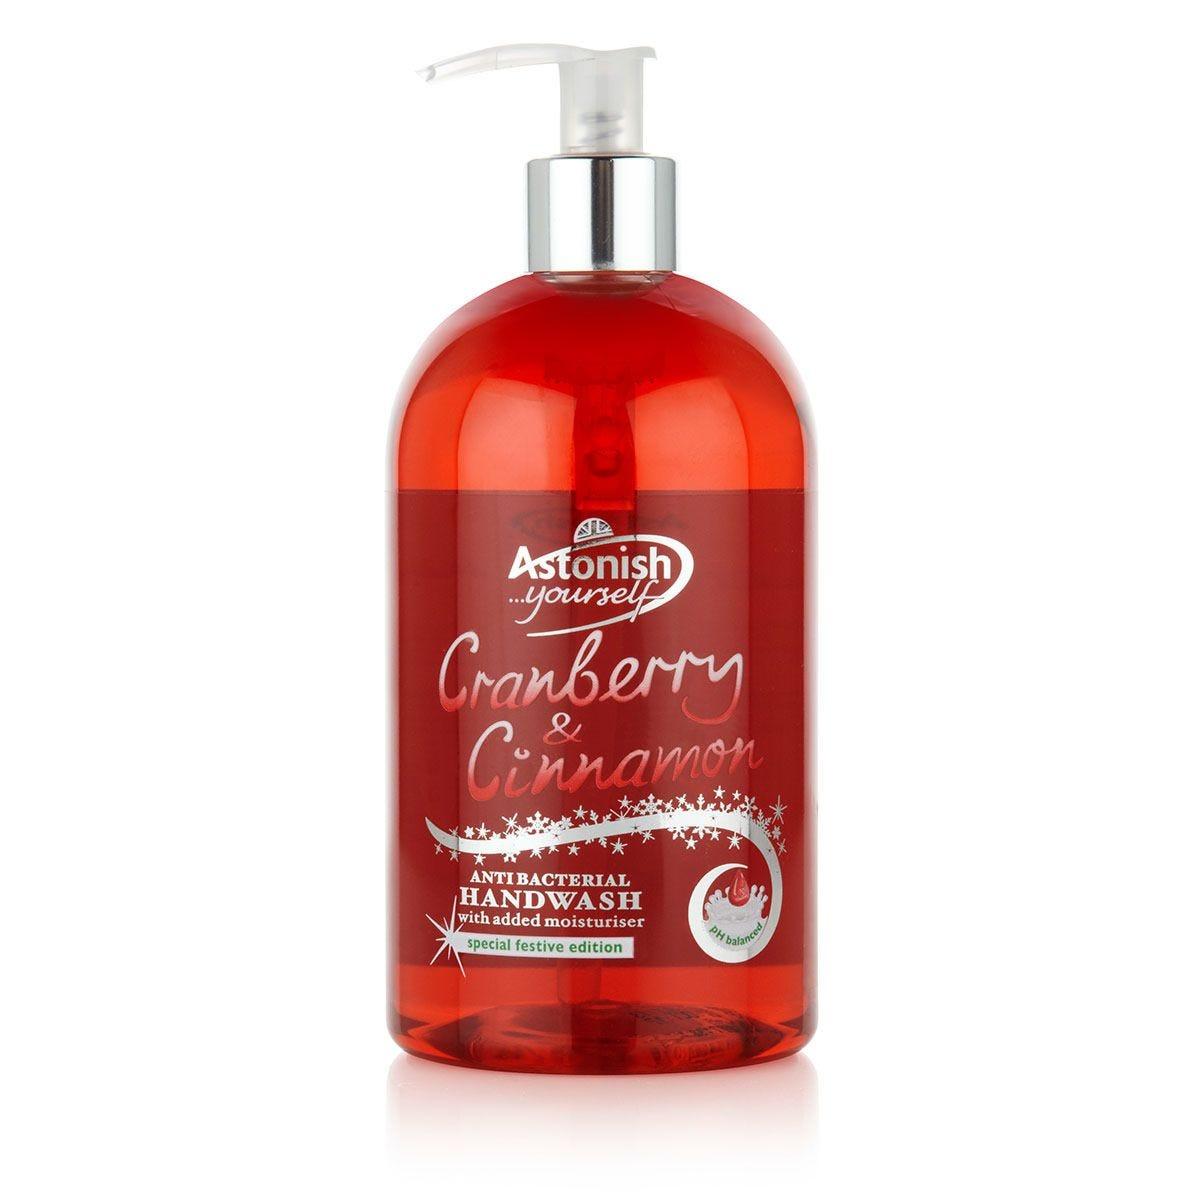 Astonish Cranberry and Cinnamon Handwash - 500ml